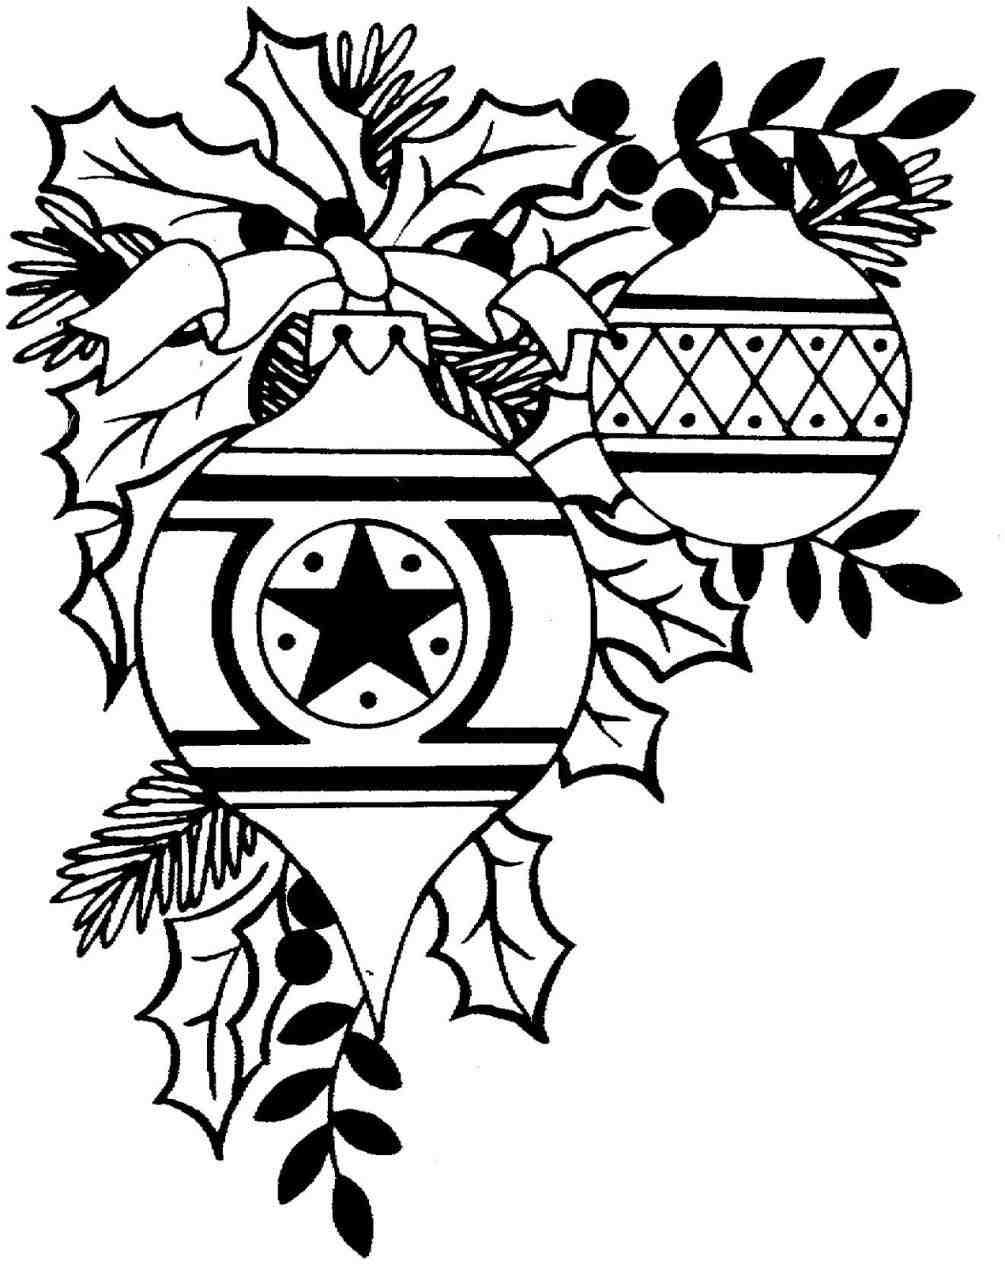 1005x1264 Ingcom Transparent Christmas Tree Clipart Free Black And White